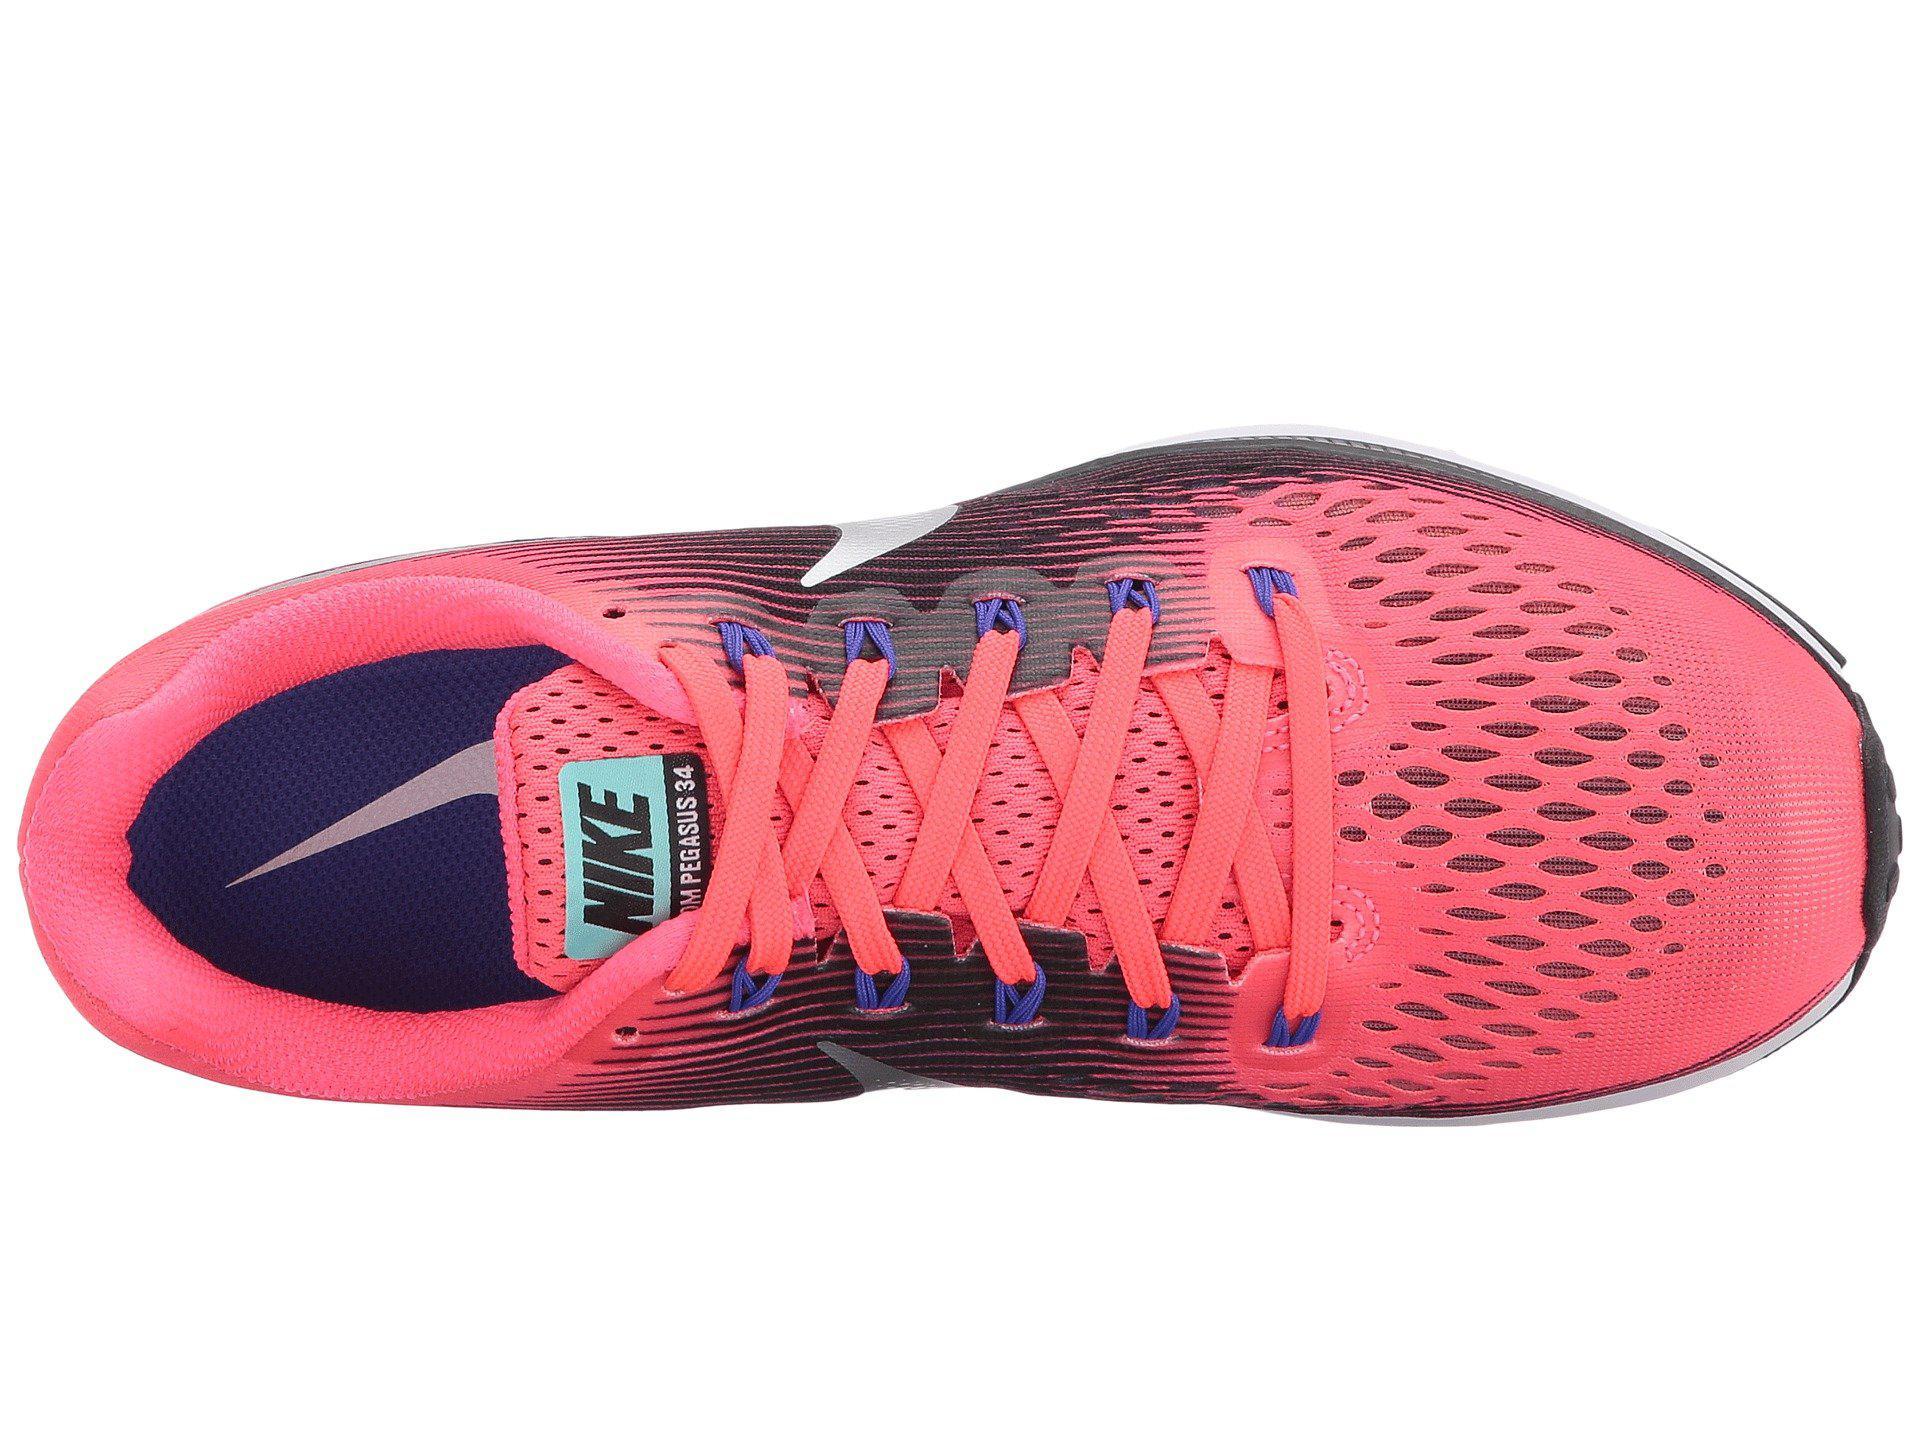 3e639e3d56fb Lyst - Nike Air Zoom Pegasus 34